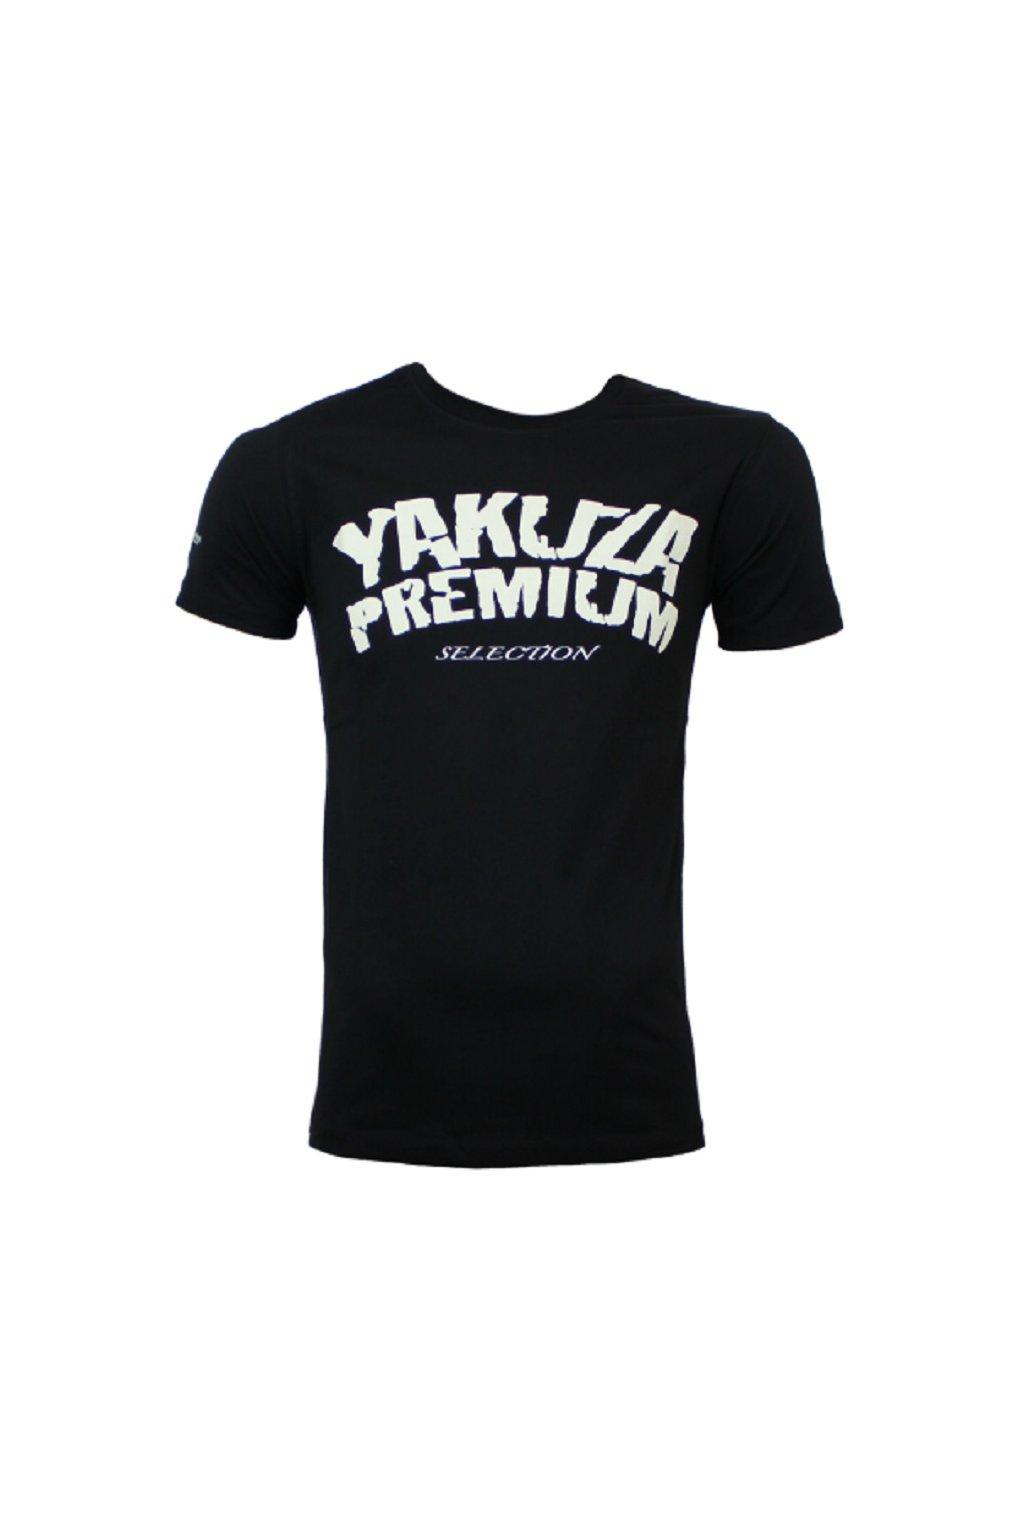 Yakuza Premium pánské triko Promo černá obr1